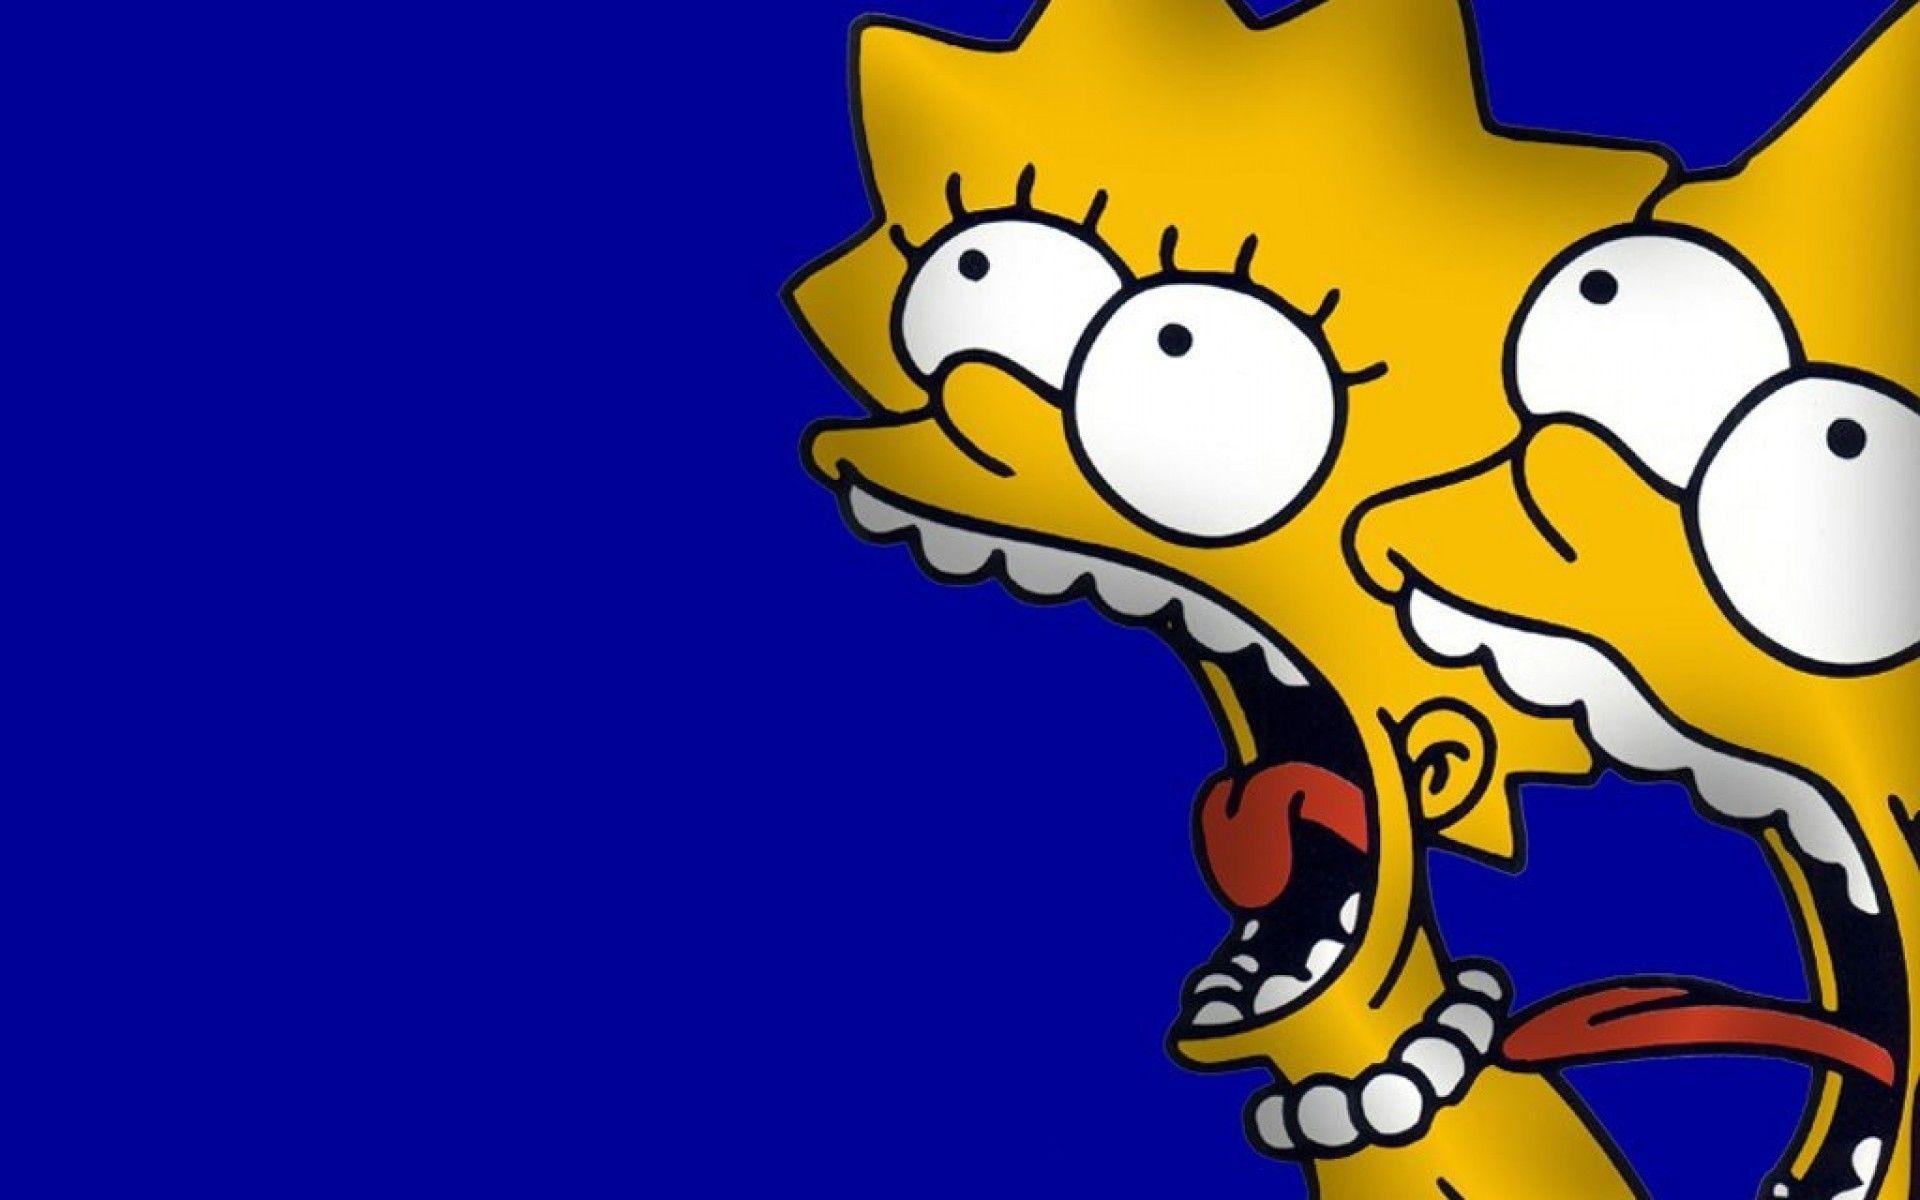 Bart Simpson Sleeping for Pinterest | Bart simpson, Bart